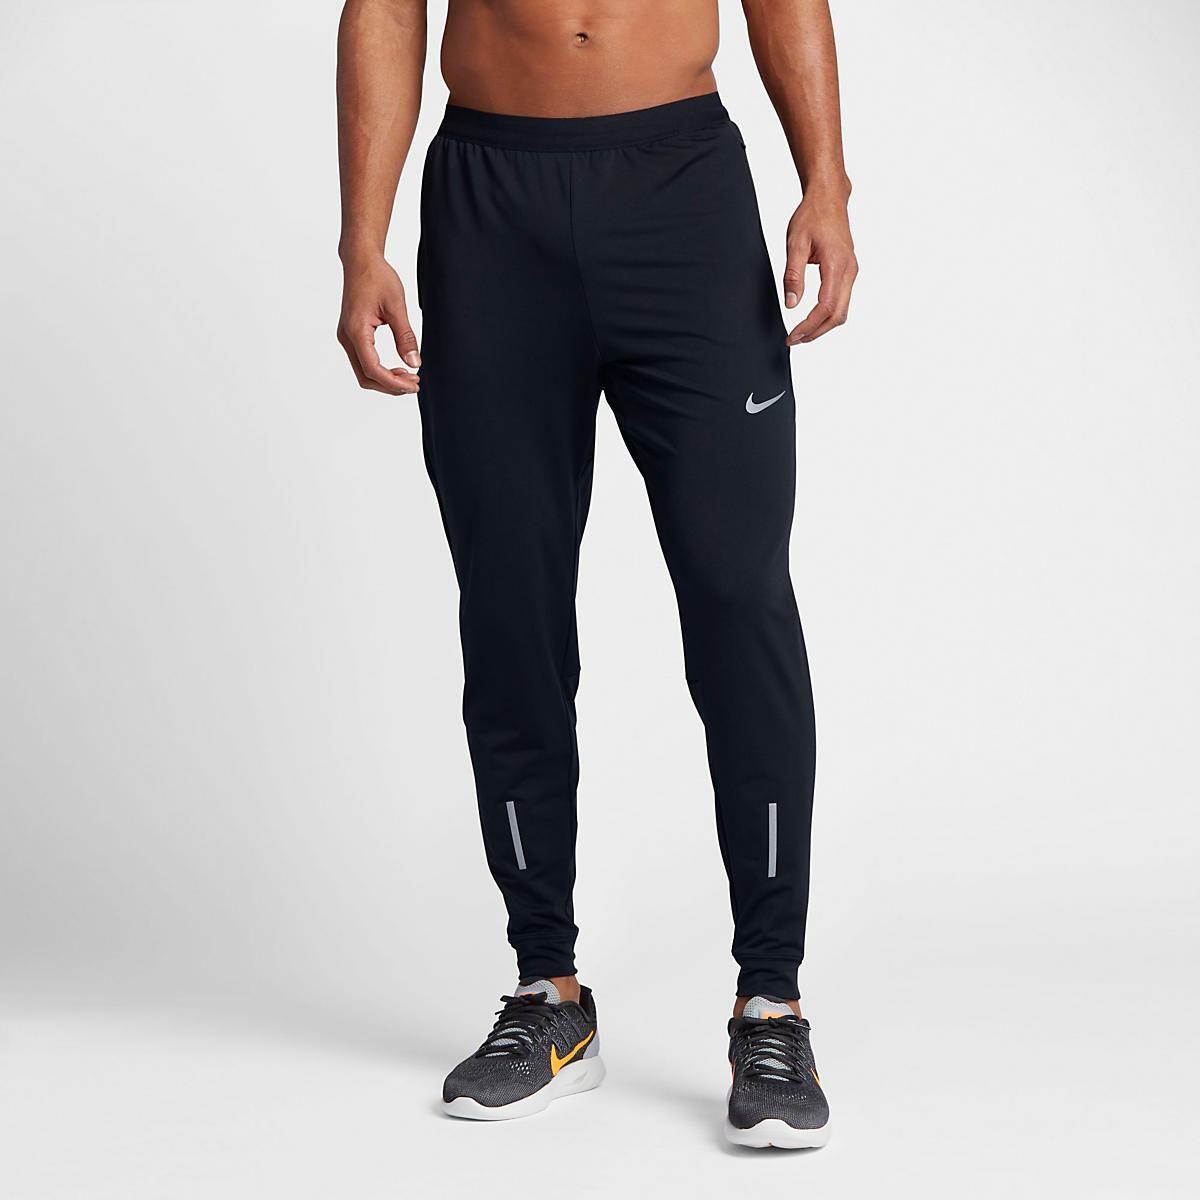 db626a237616db Mens Nike Dry Phenom Pants at Road Runner Sports